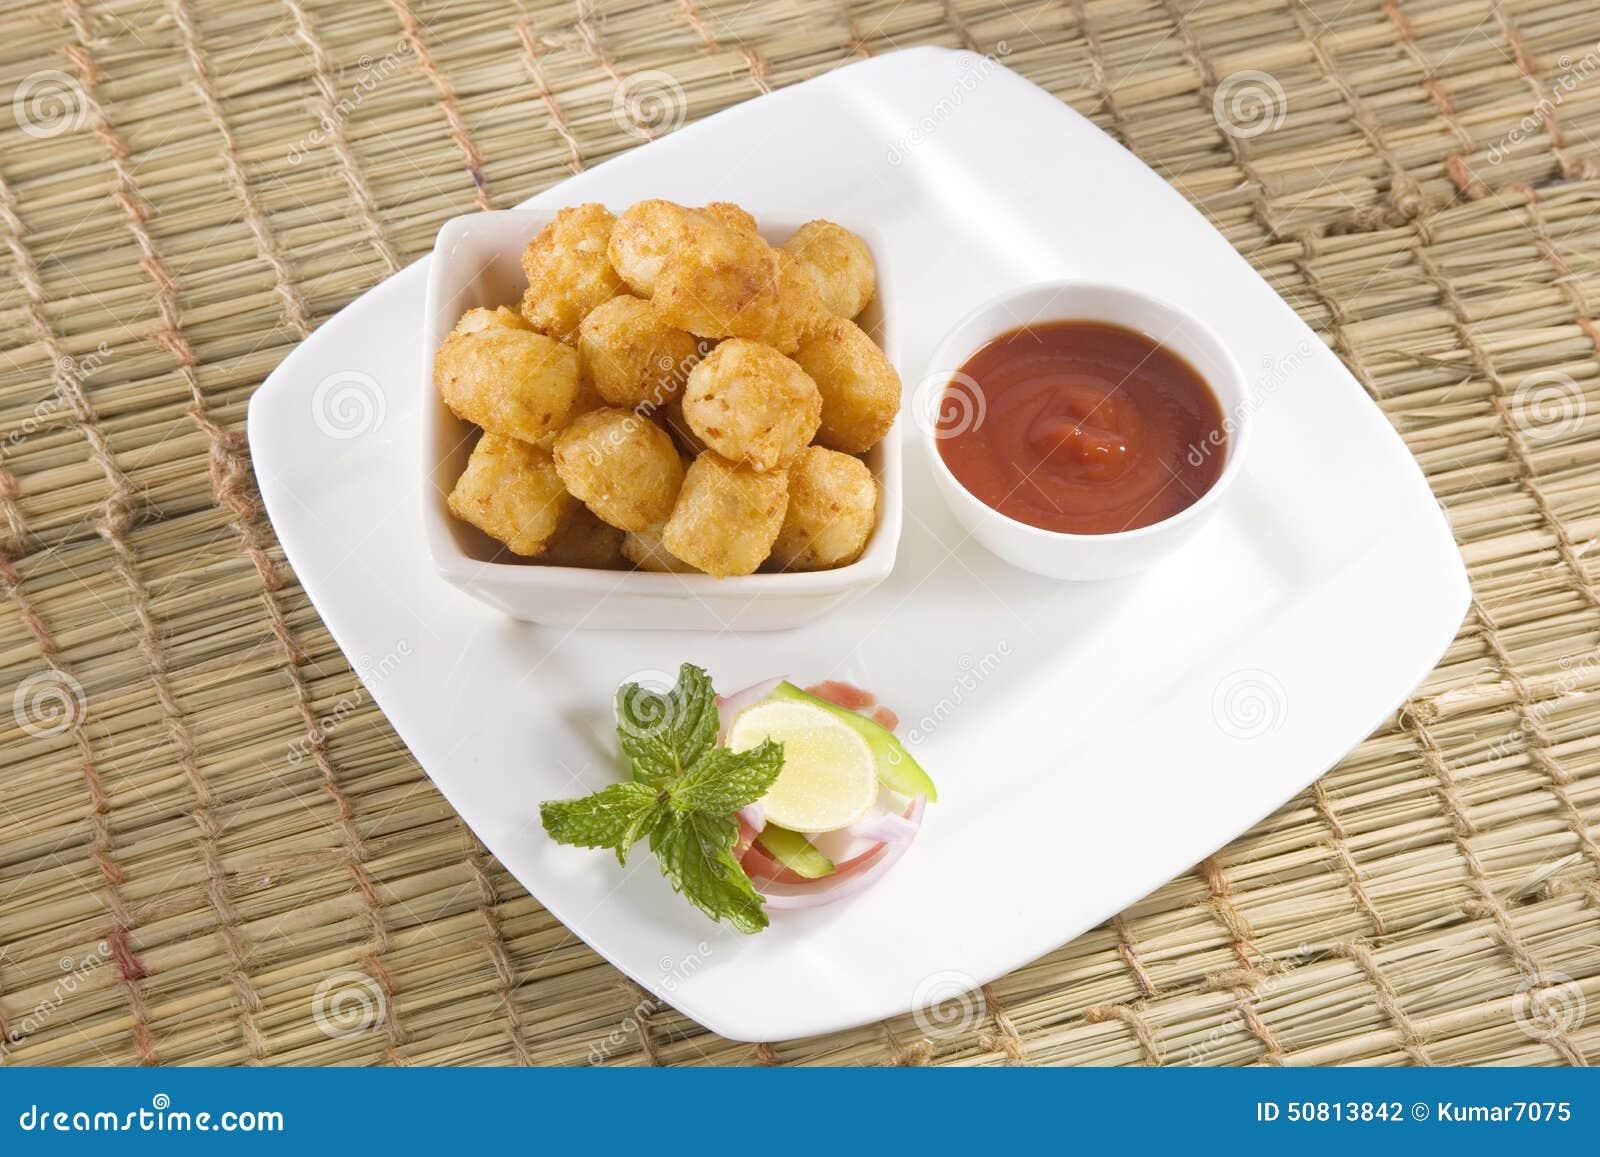 Fried Potato Nuggets